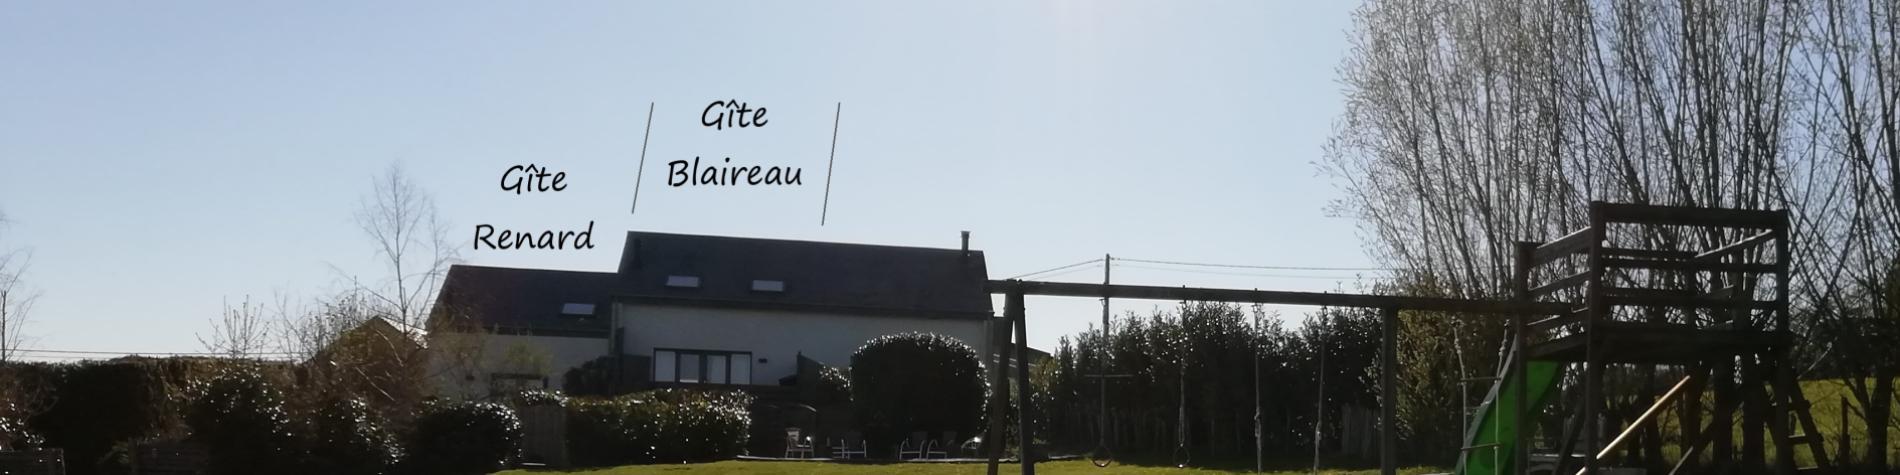 Gîte Nos rêves - Renard et Gîte Blaireau - Warempage - La Roche-en-Ardenne